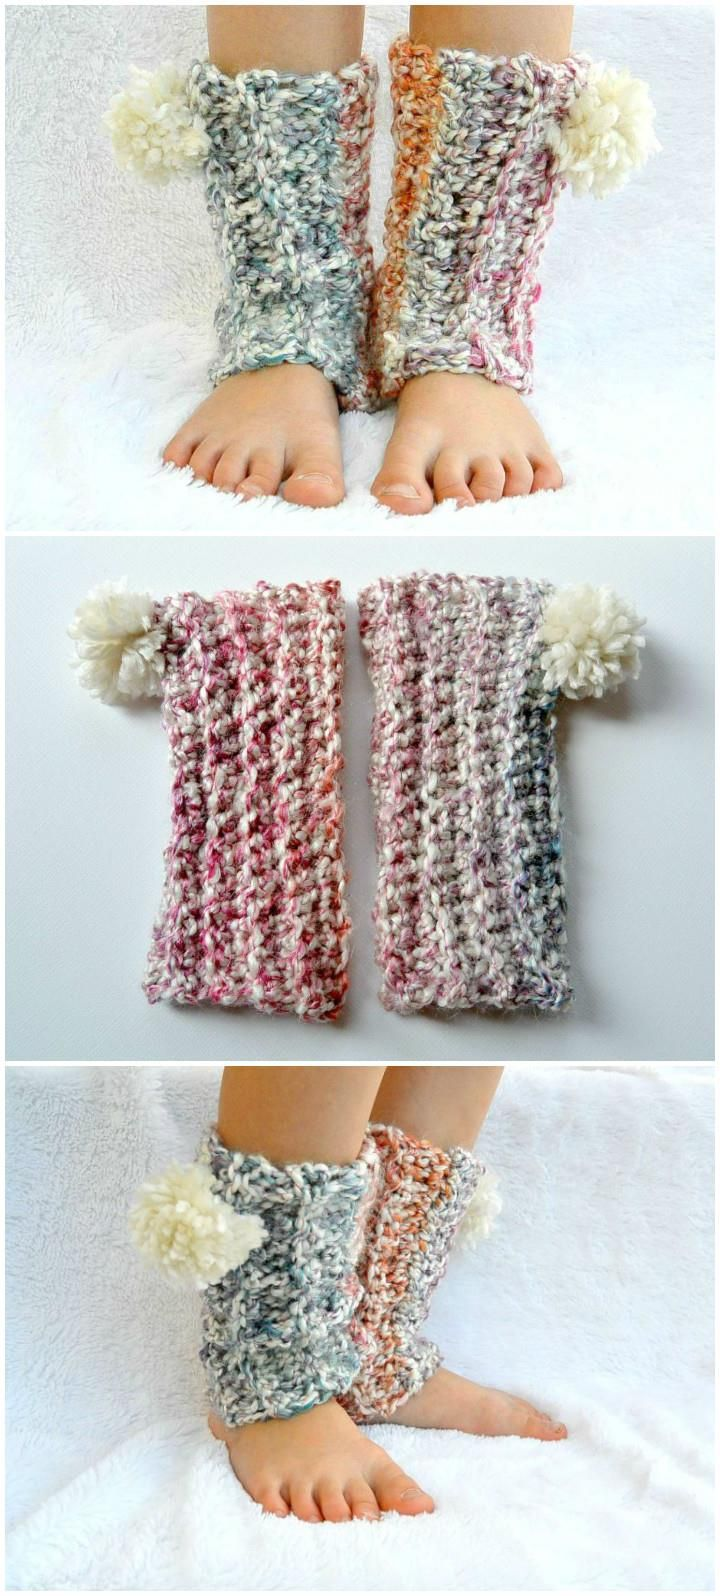 Lovely Crochet Snow Flurry Leg Warmers: - 101 Free Crochet Patterns - Full Instructions for Beginners   101 Crochet - Part 4